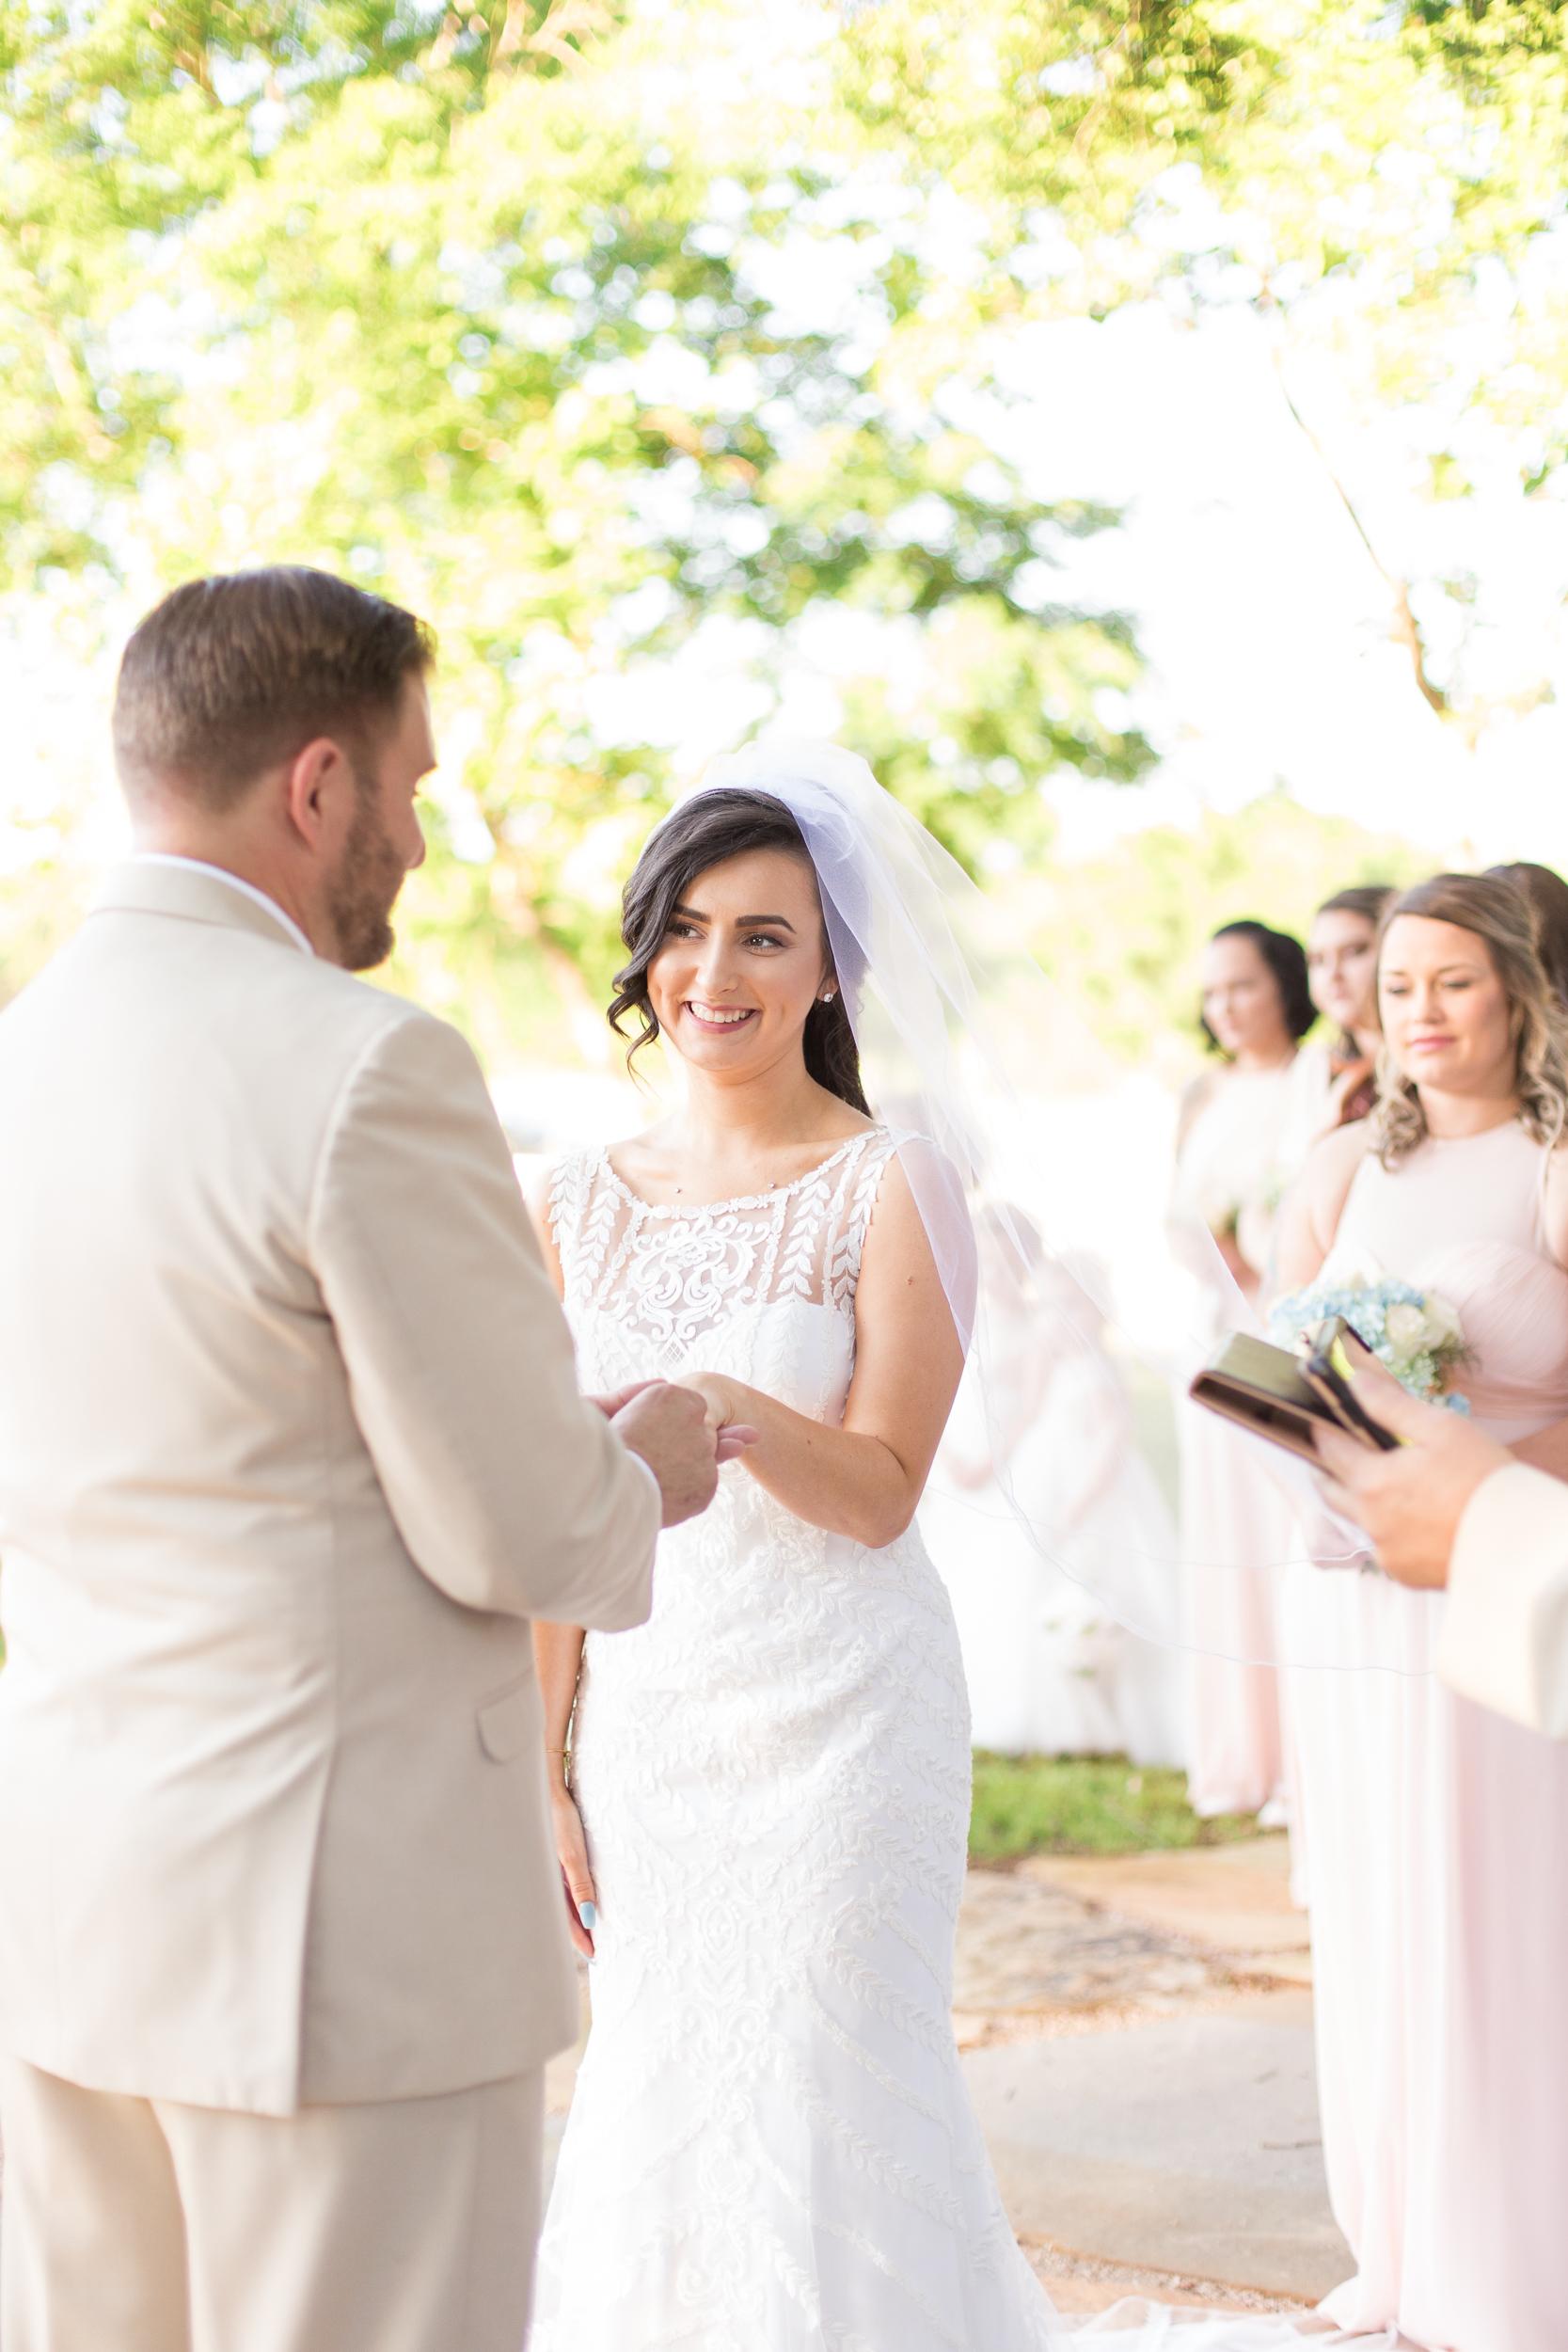 Zihlman-East TX Wedding_Kelsie Hendricks Photography_The Folmar Tyler Texas-107.jpg